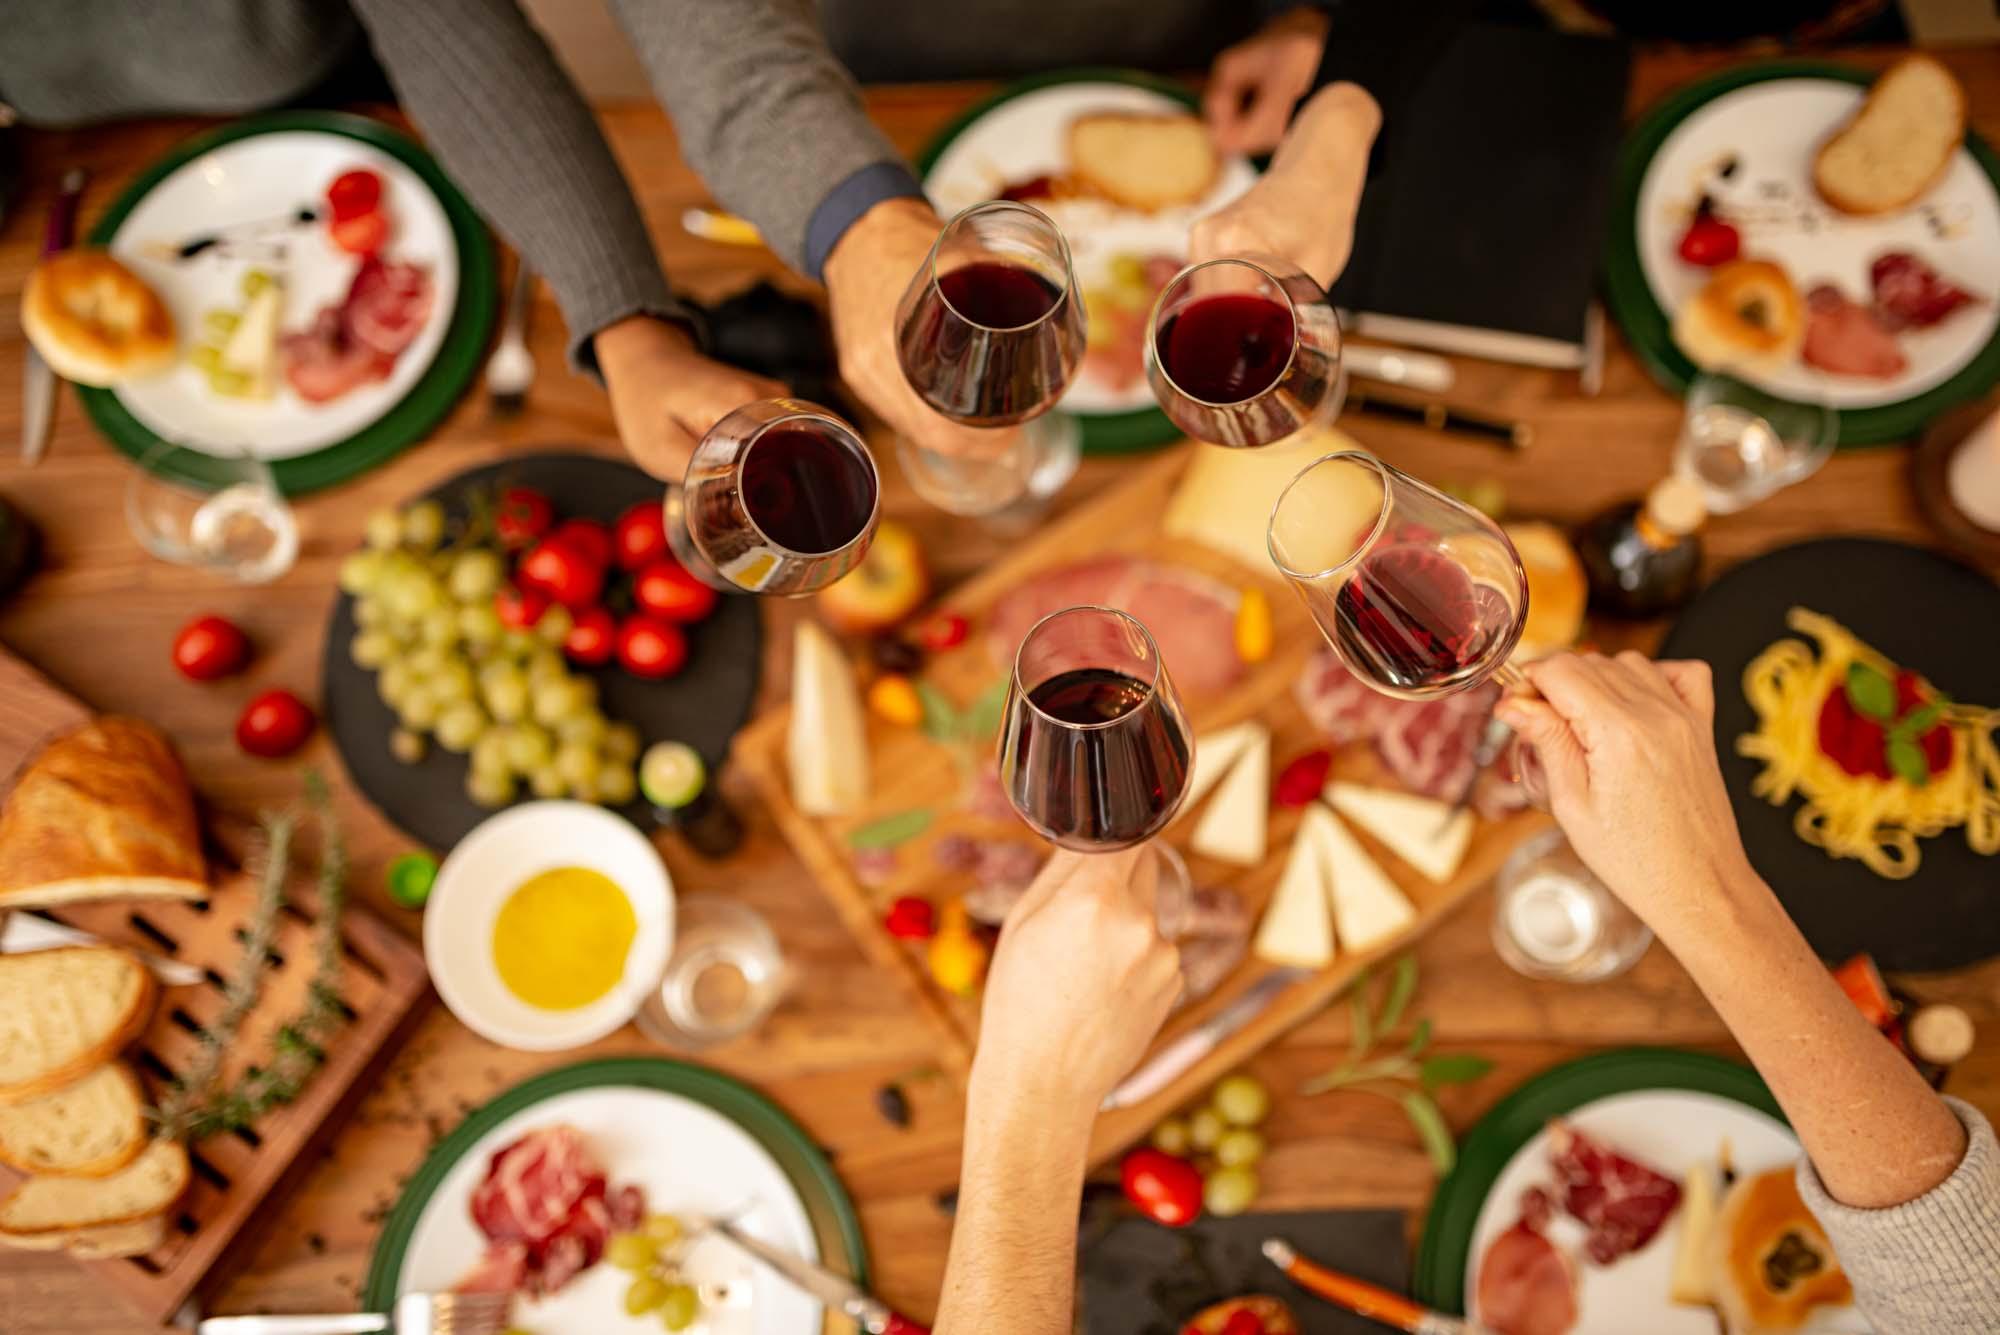 Corsi Di Cucina Eventi Aziendali a Parma